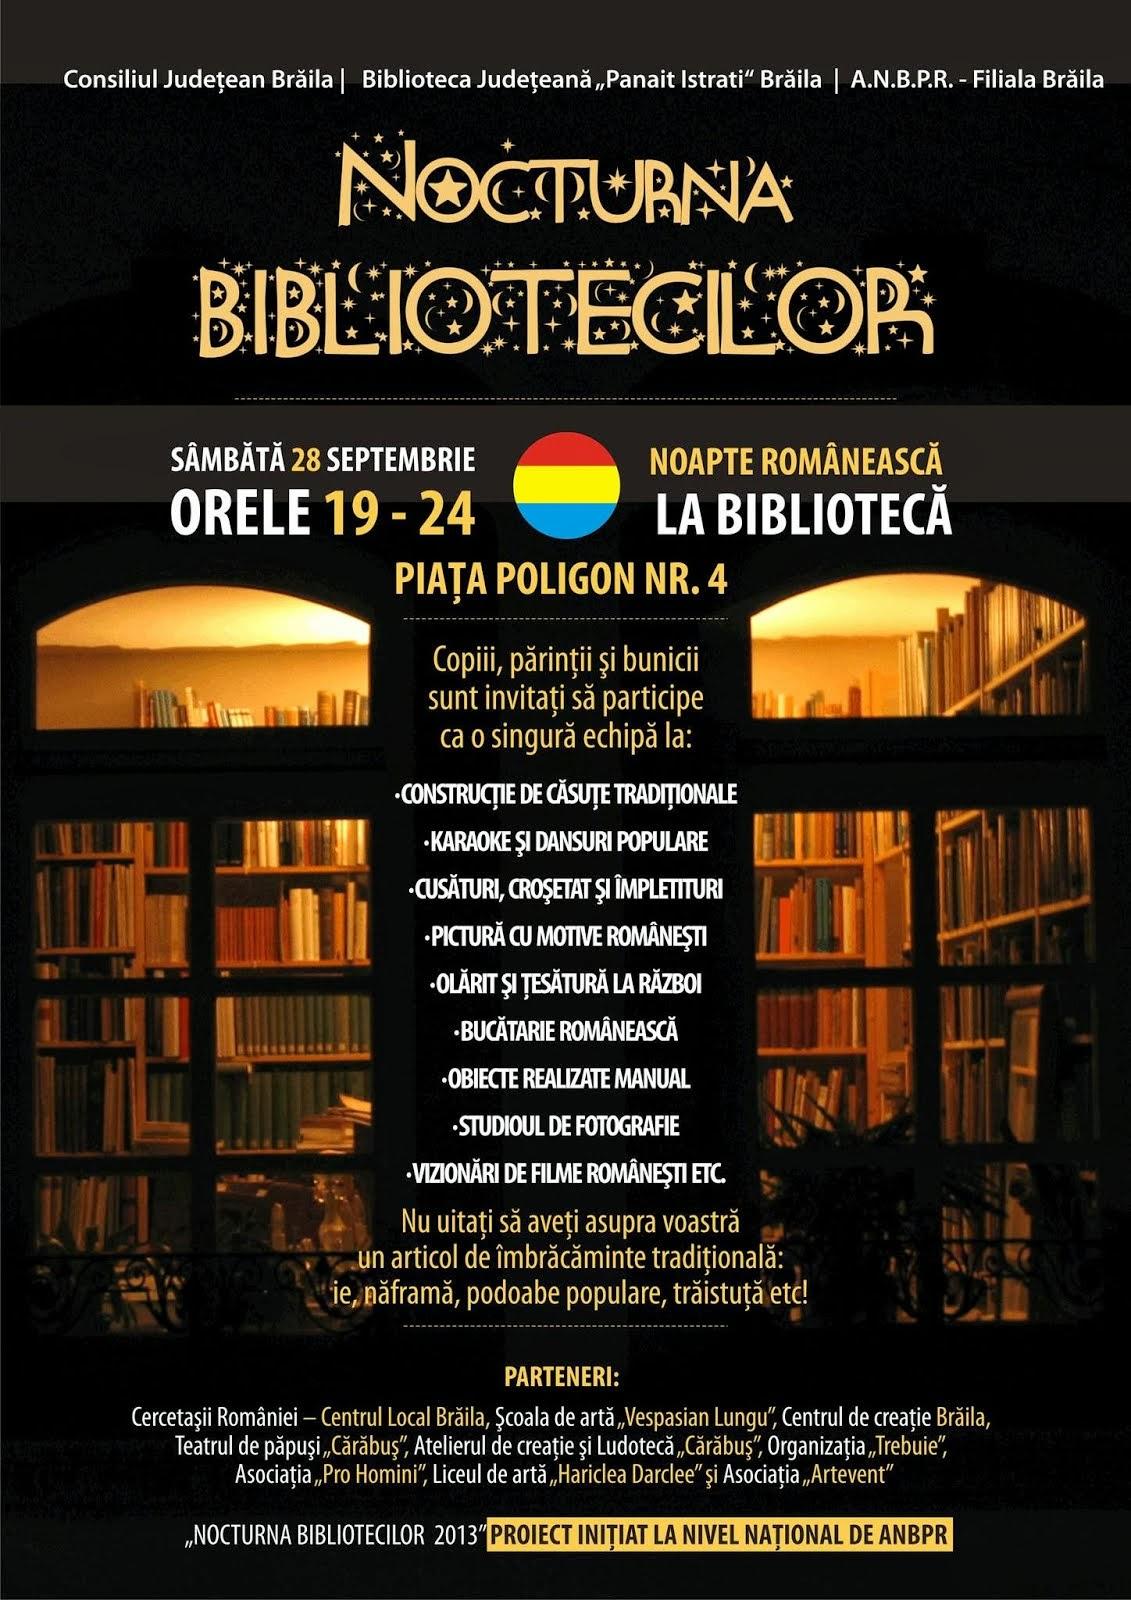 Nocturna Bibliotecilor 2013